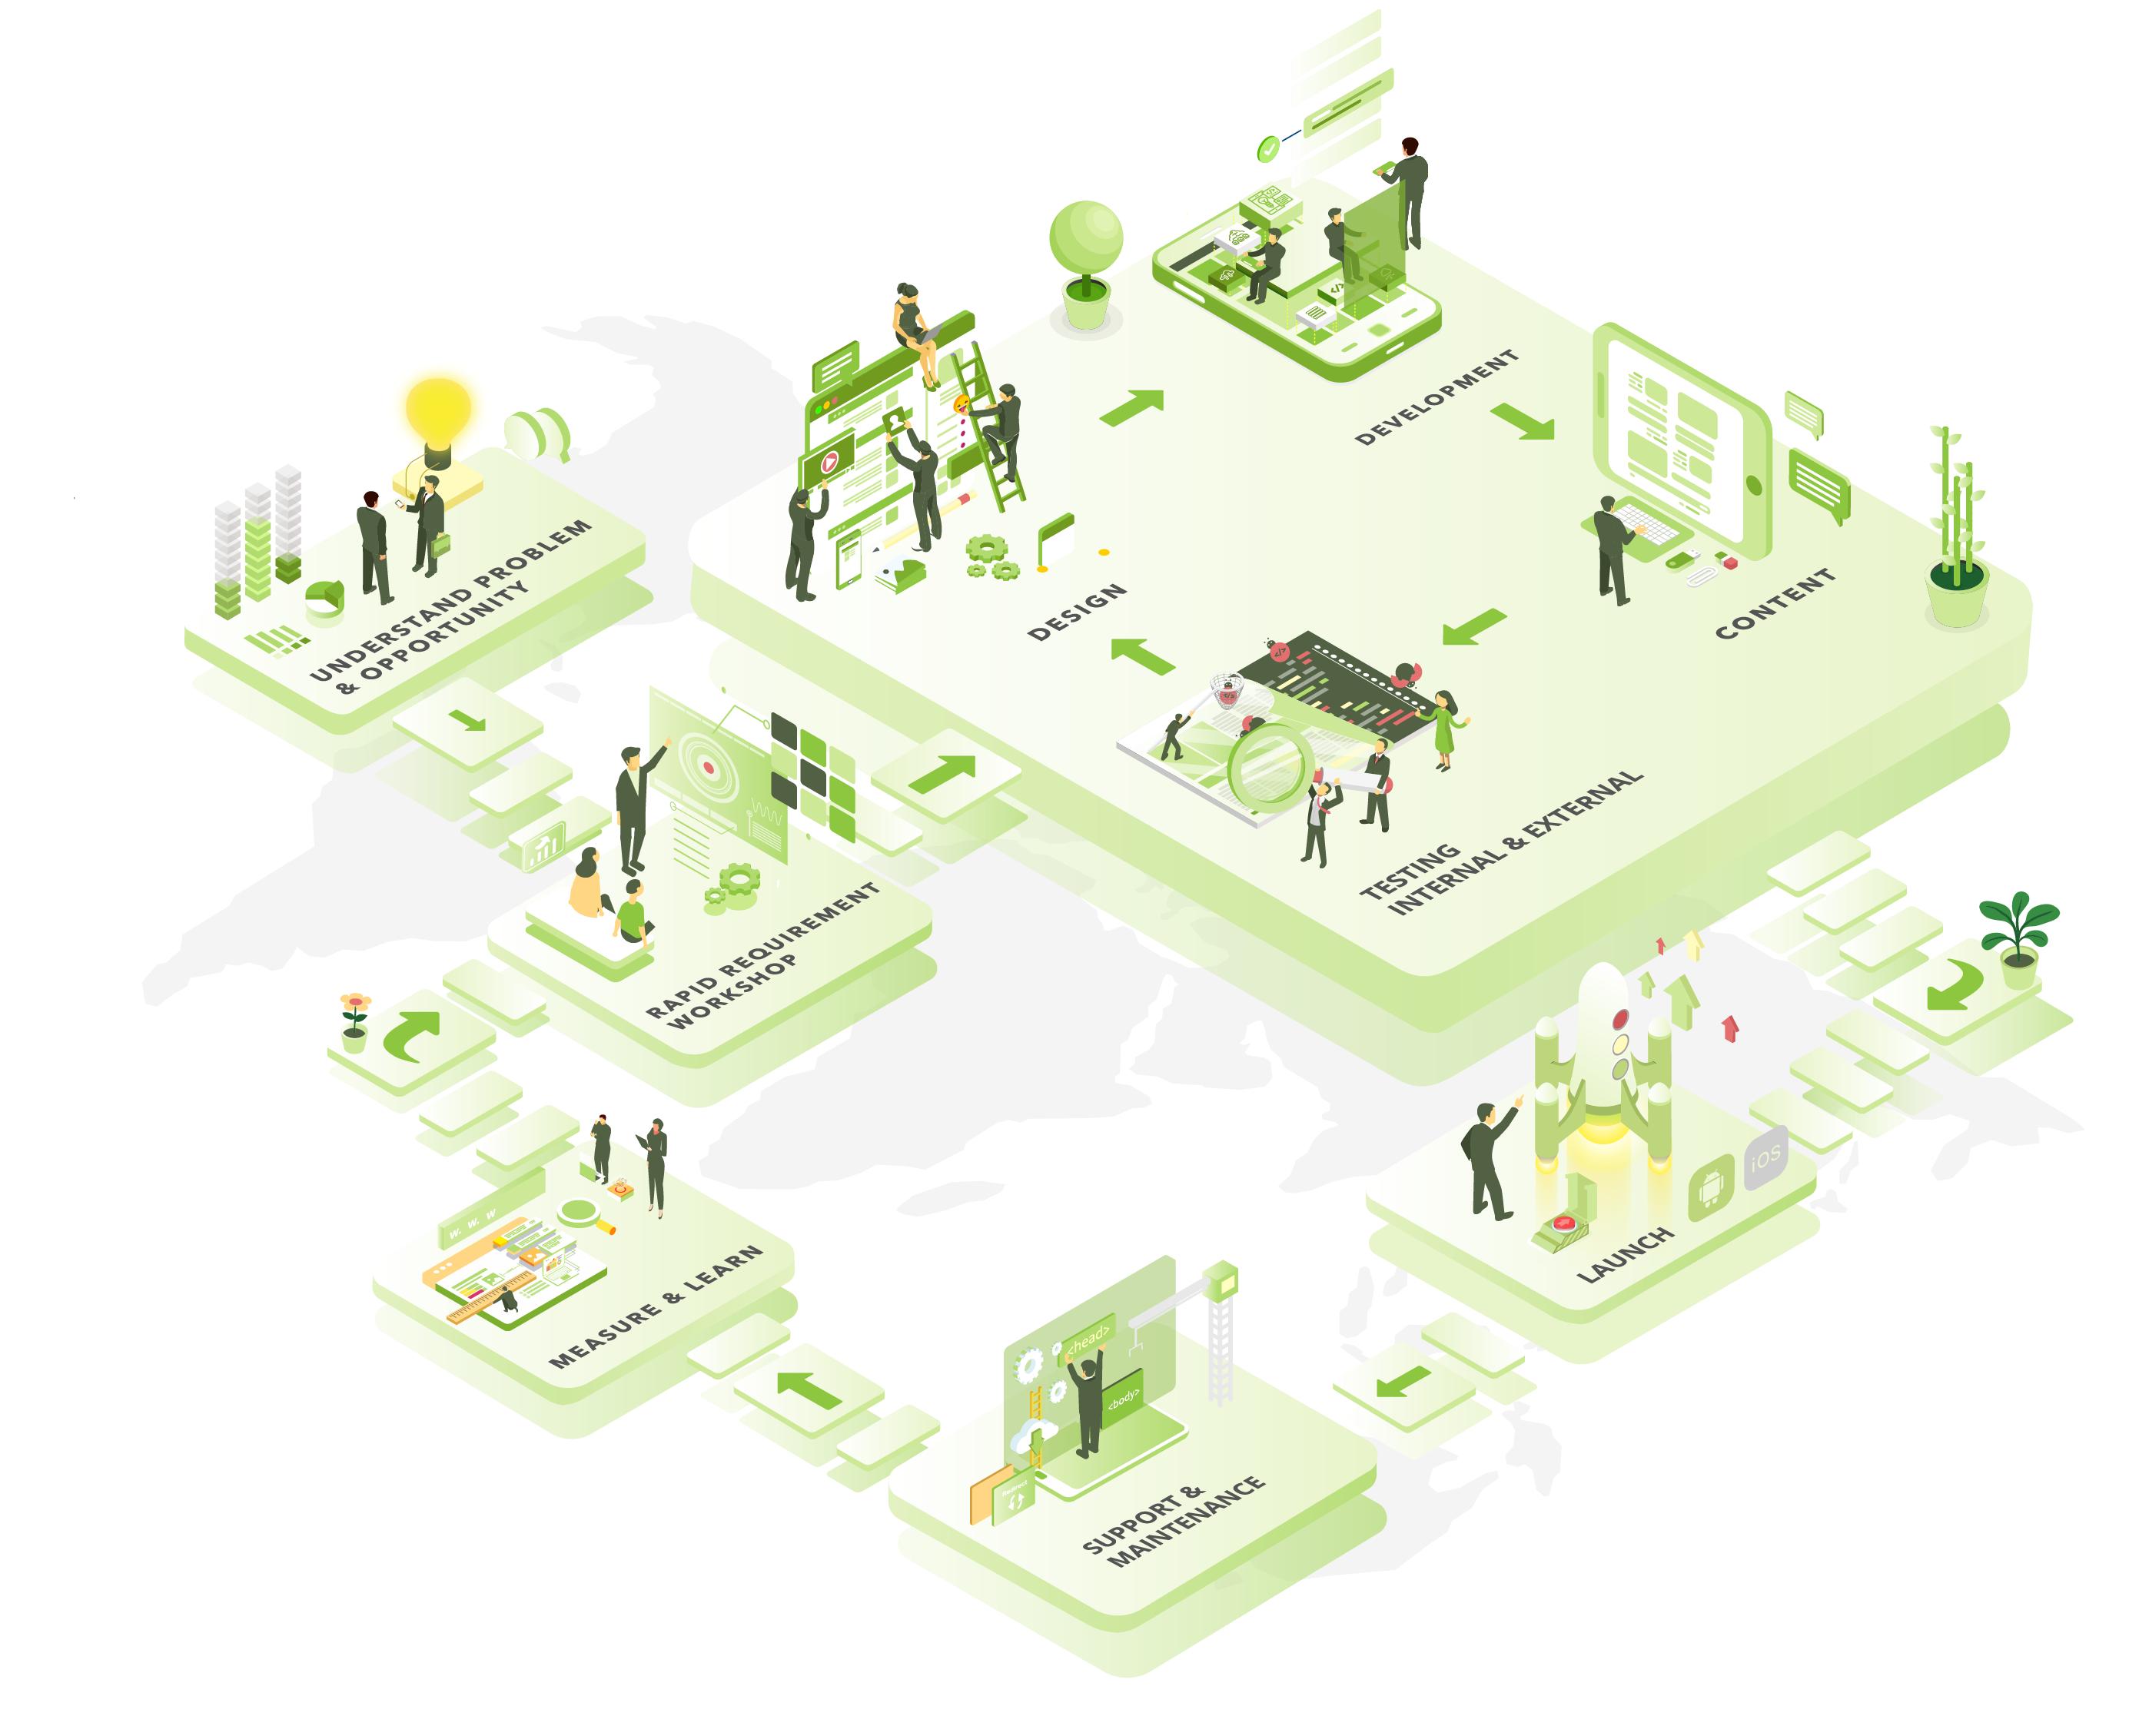 Web Application Development Process - Saigon Technology